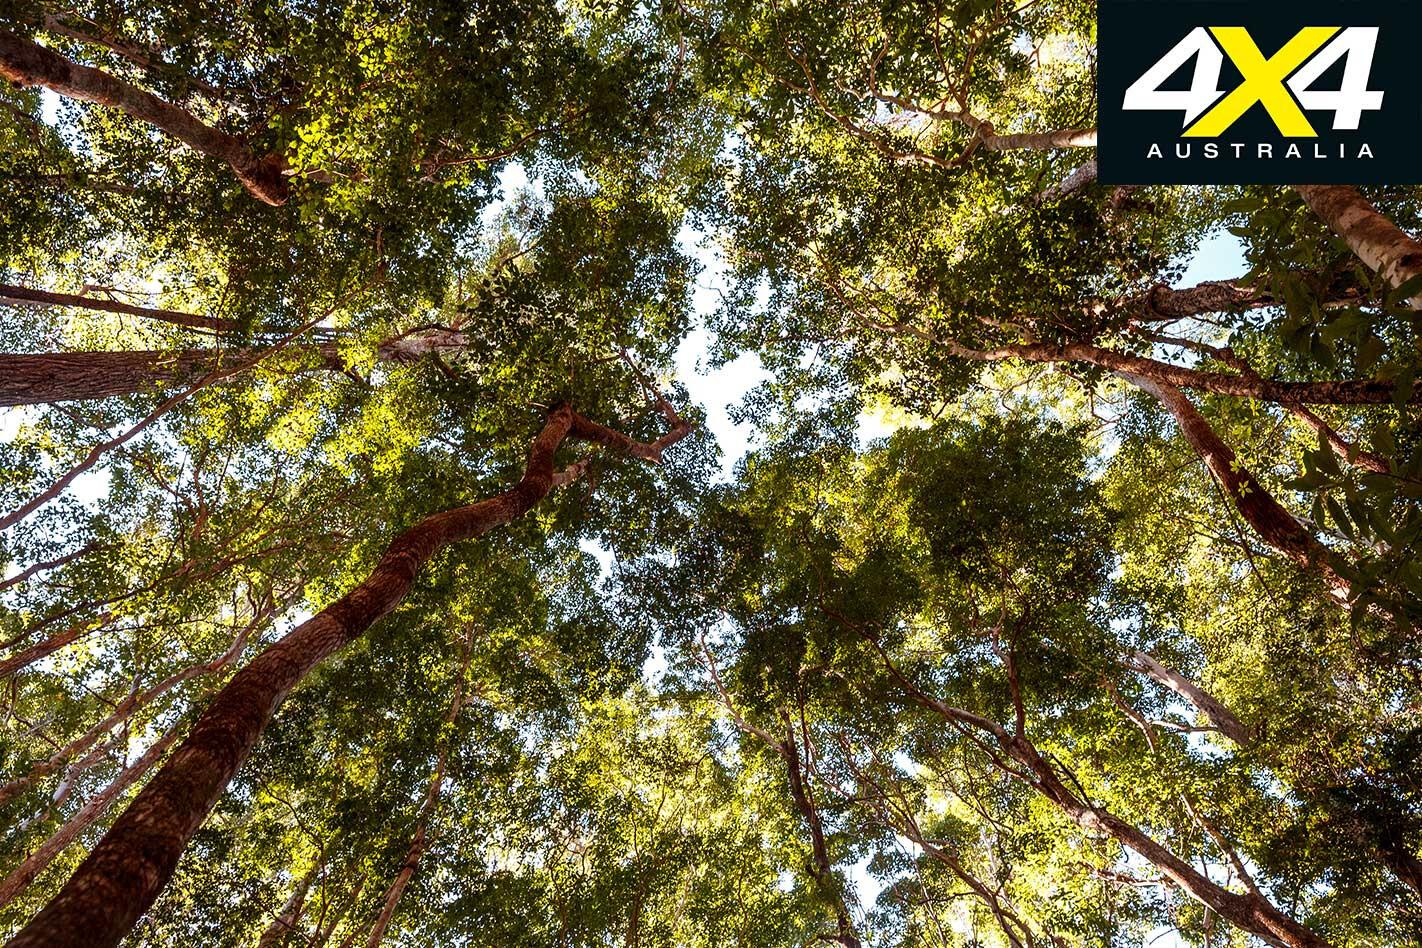 4 X 4 Adventure Series South East Queensland Part 2 Fraser Island Satinay Trees Jpg